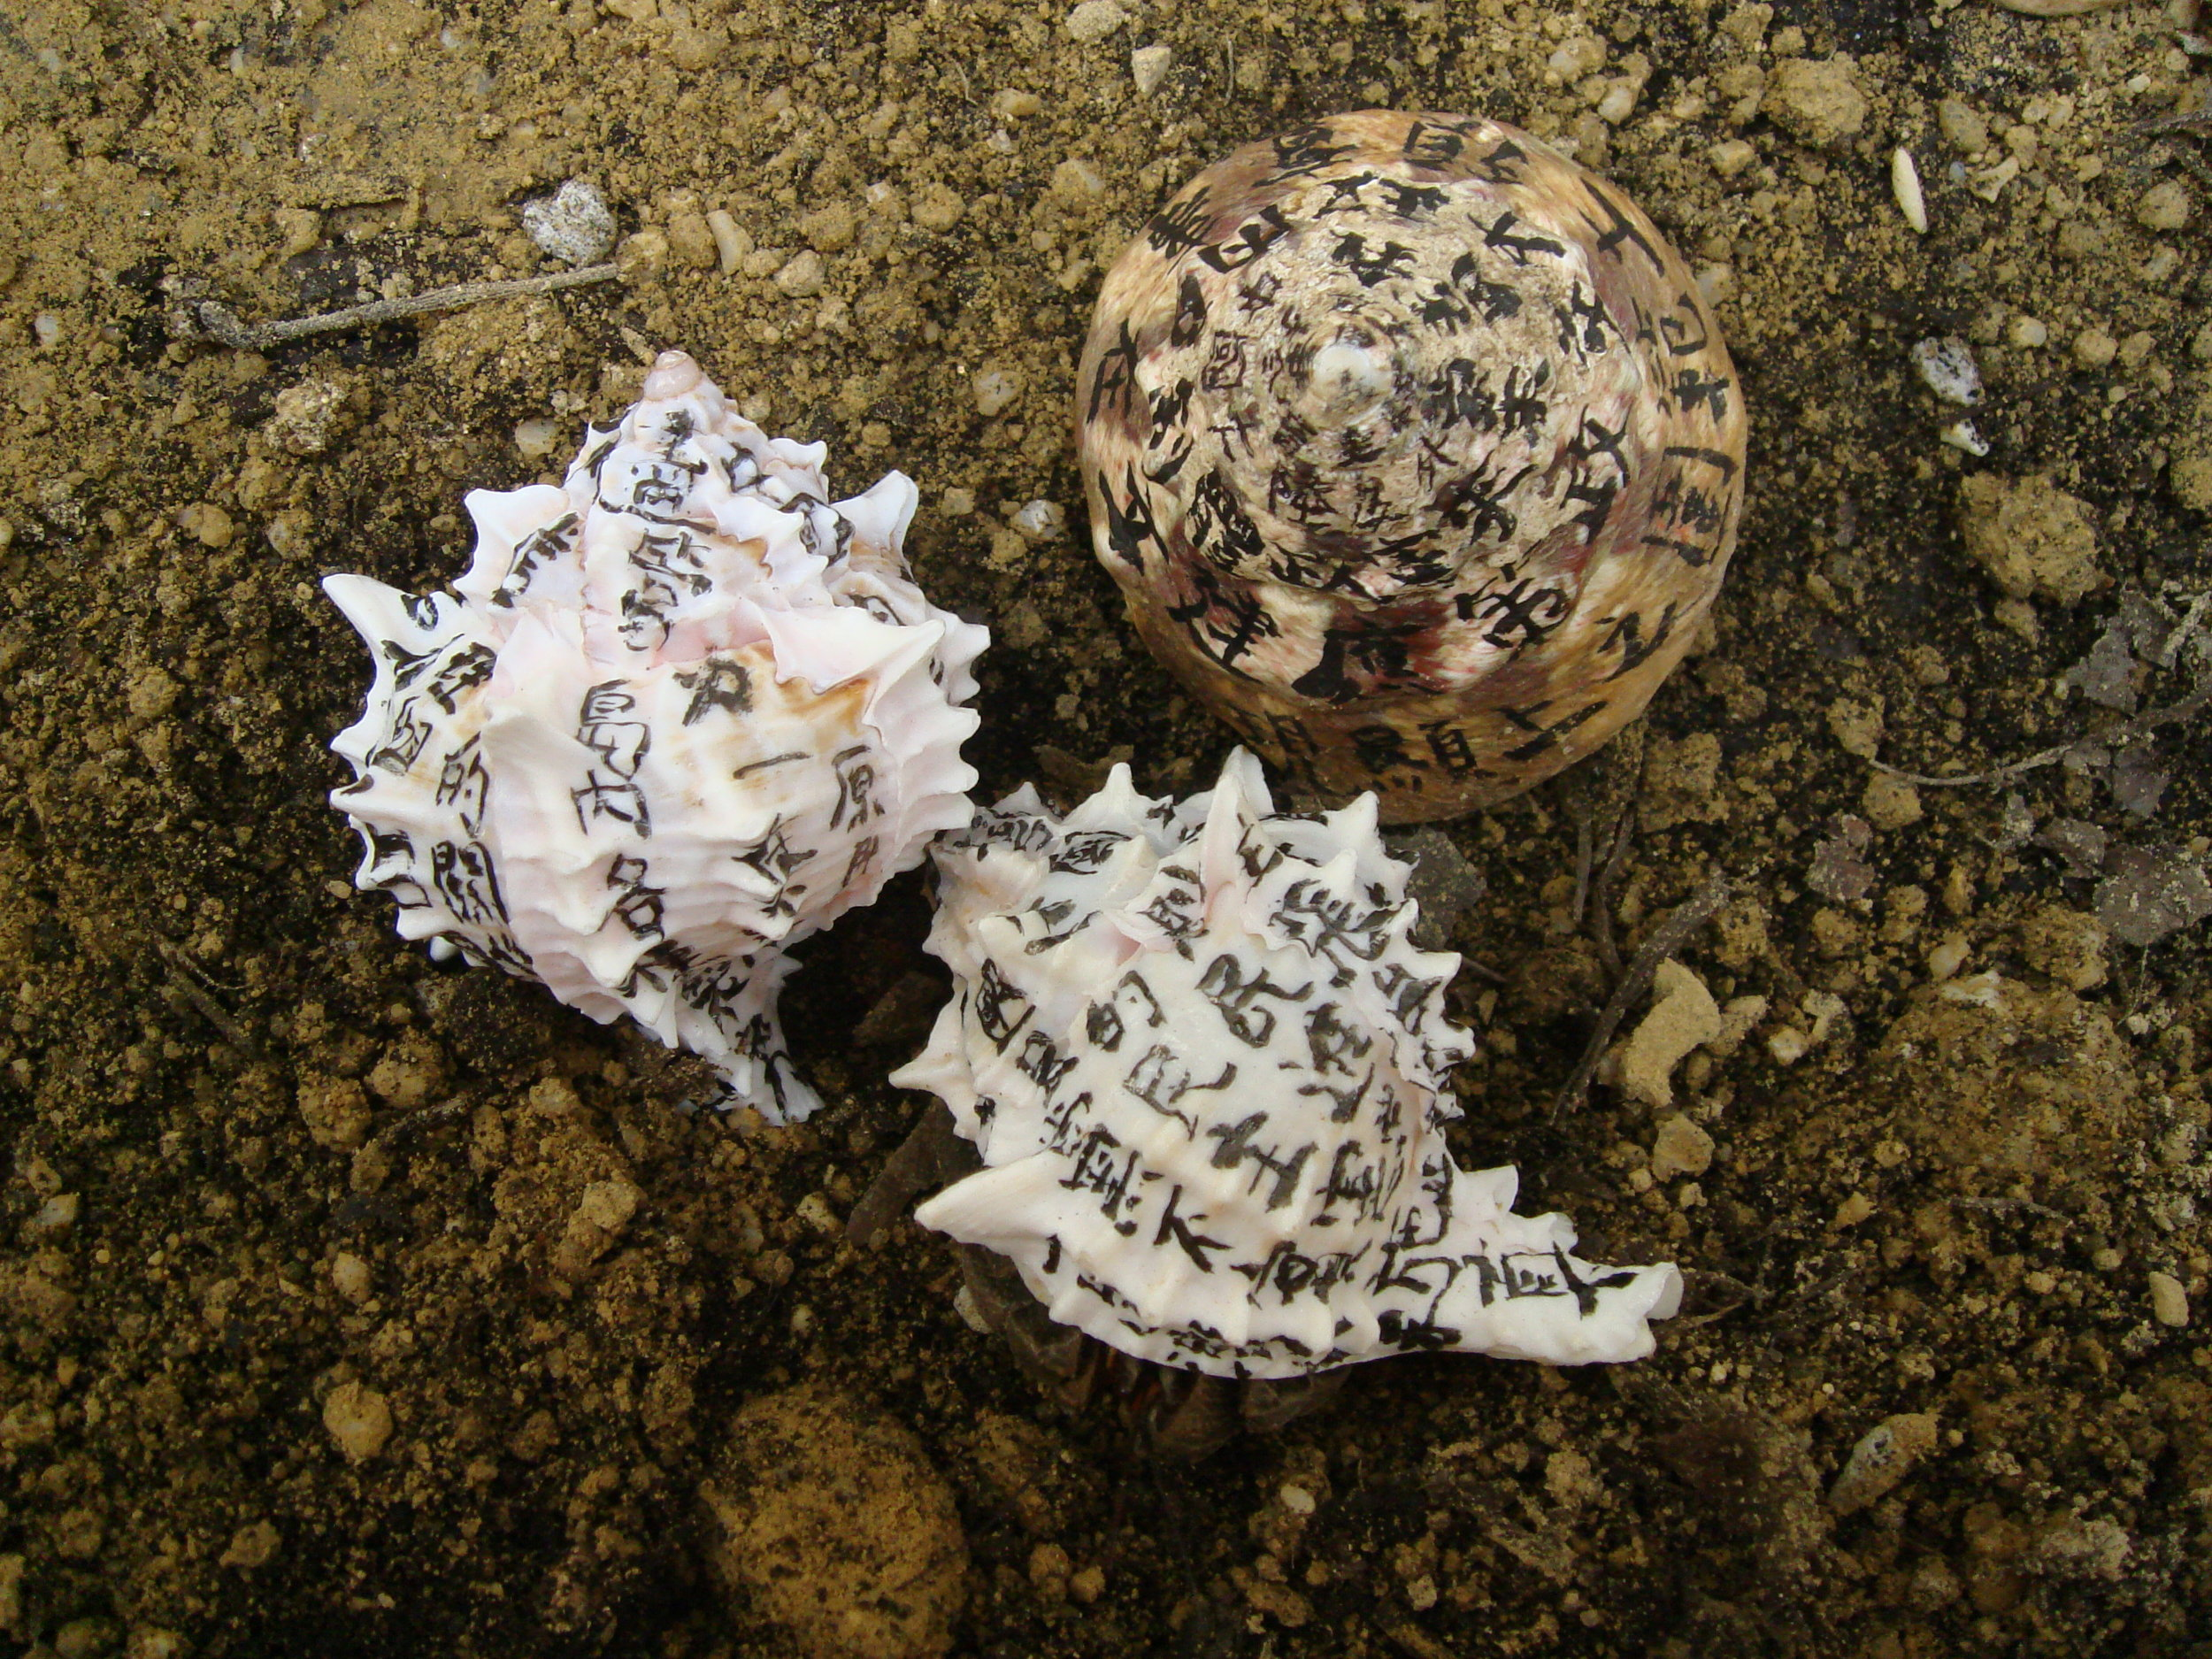 2008, Hermit Crab 01, Photograph, 66 x 88cm